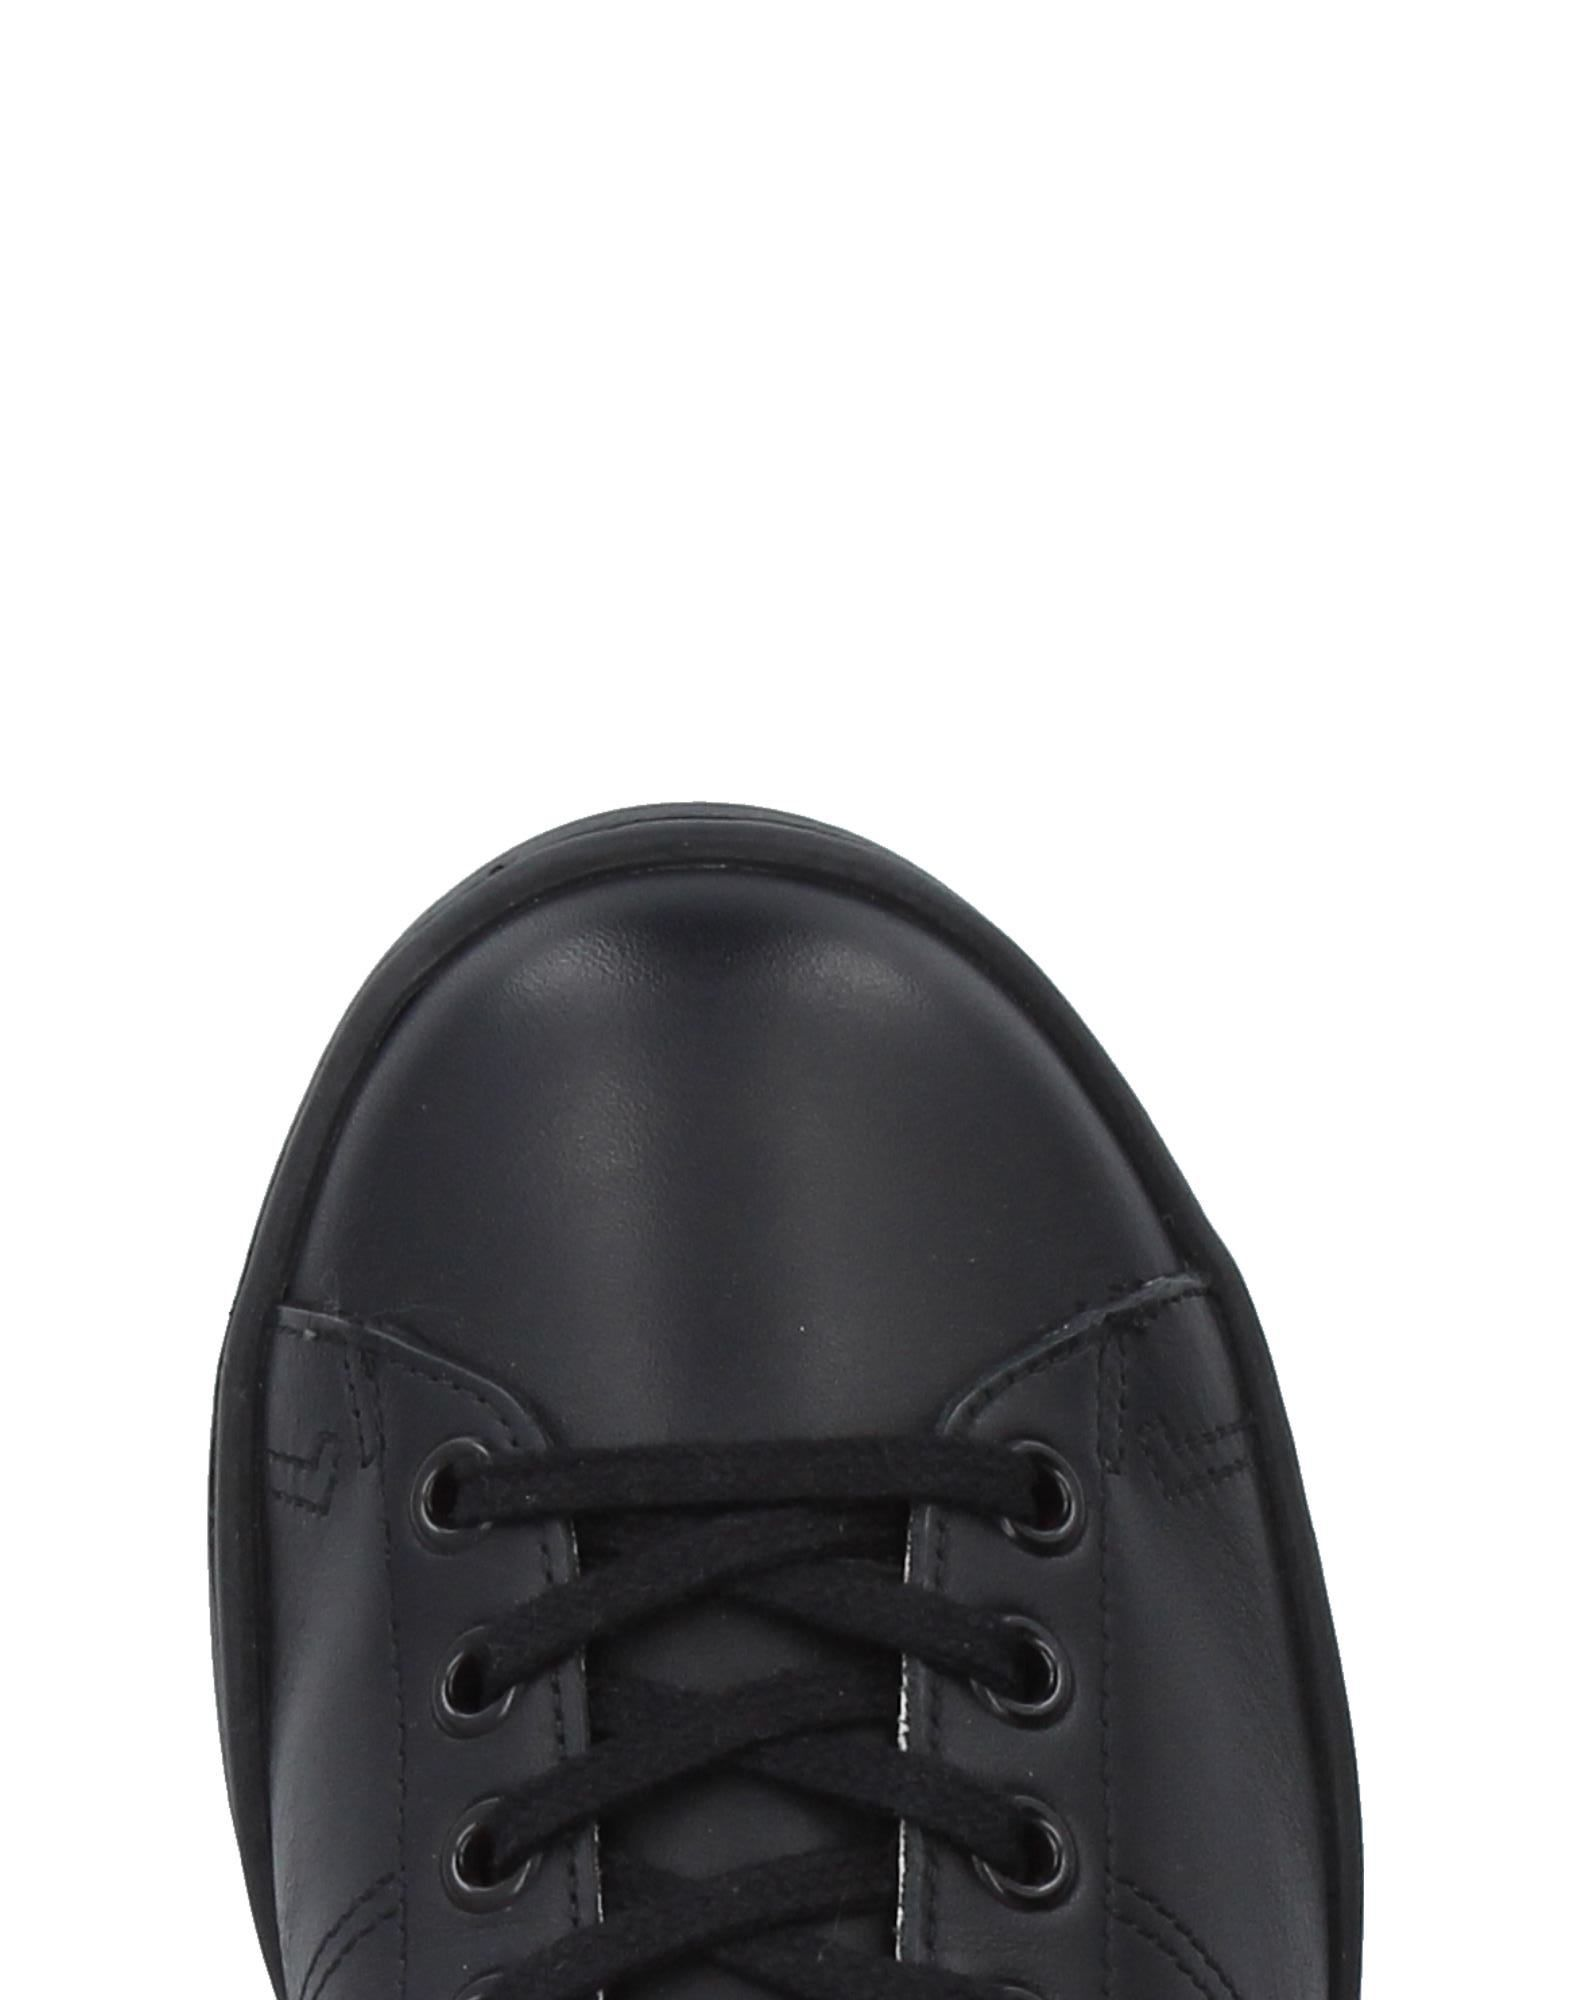 Isabel Marant Étoile Sneakers Damen Schuhe  11406399UBGut aussehende strapazierfähige Schuhe Damen 9e7609